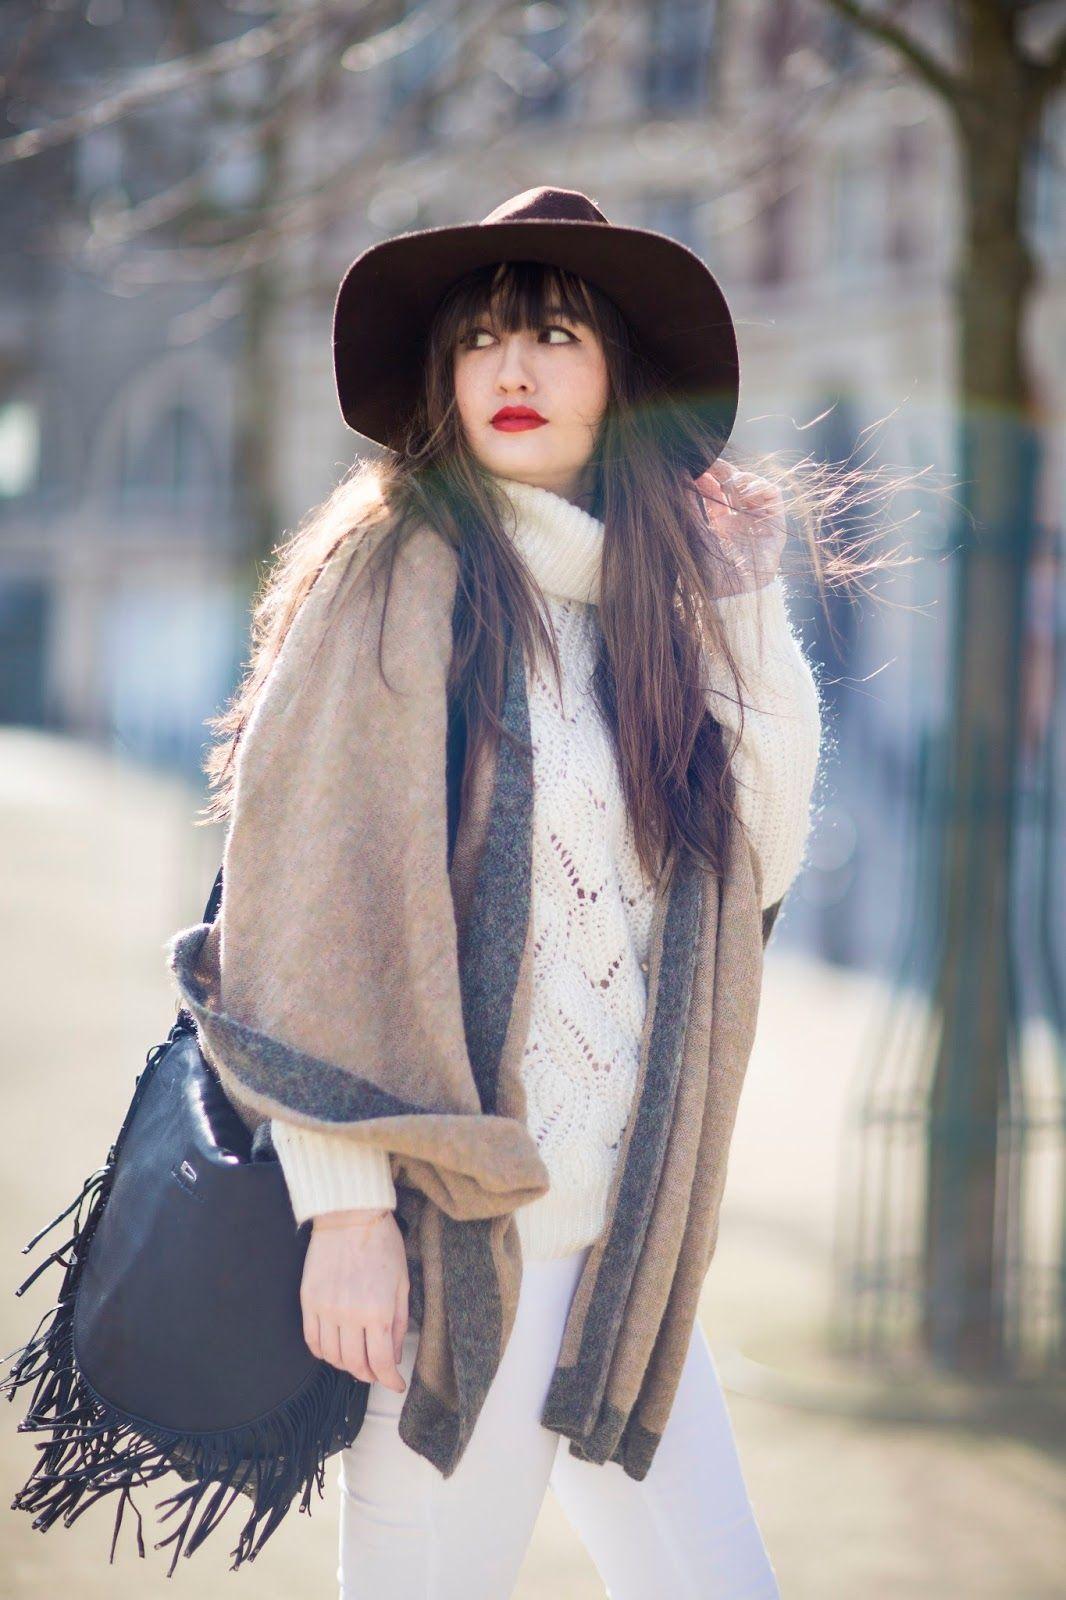 meet me in paree, blogger, fashion, style, look, paris, street style, mode, parisian look